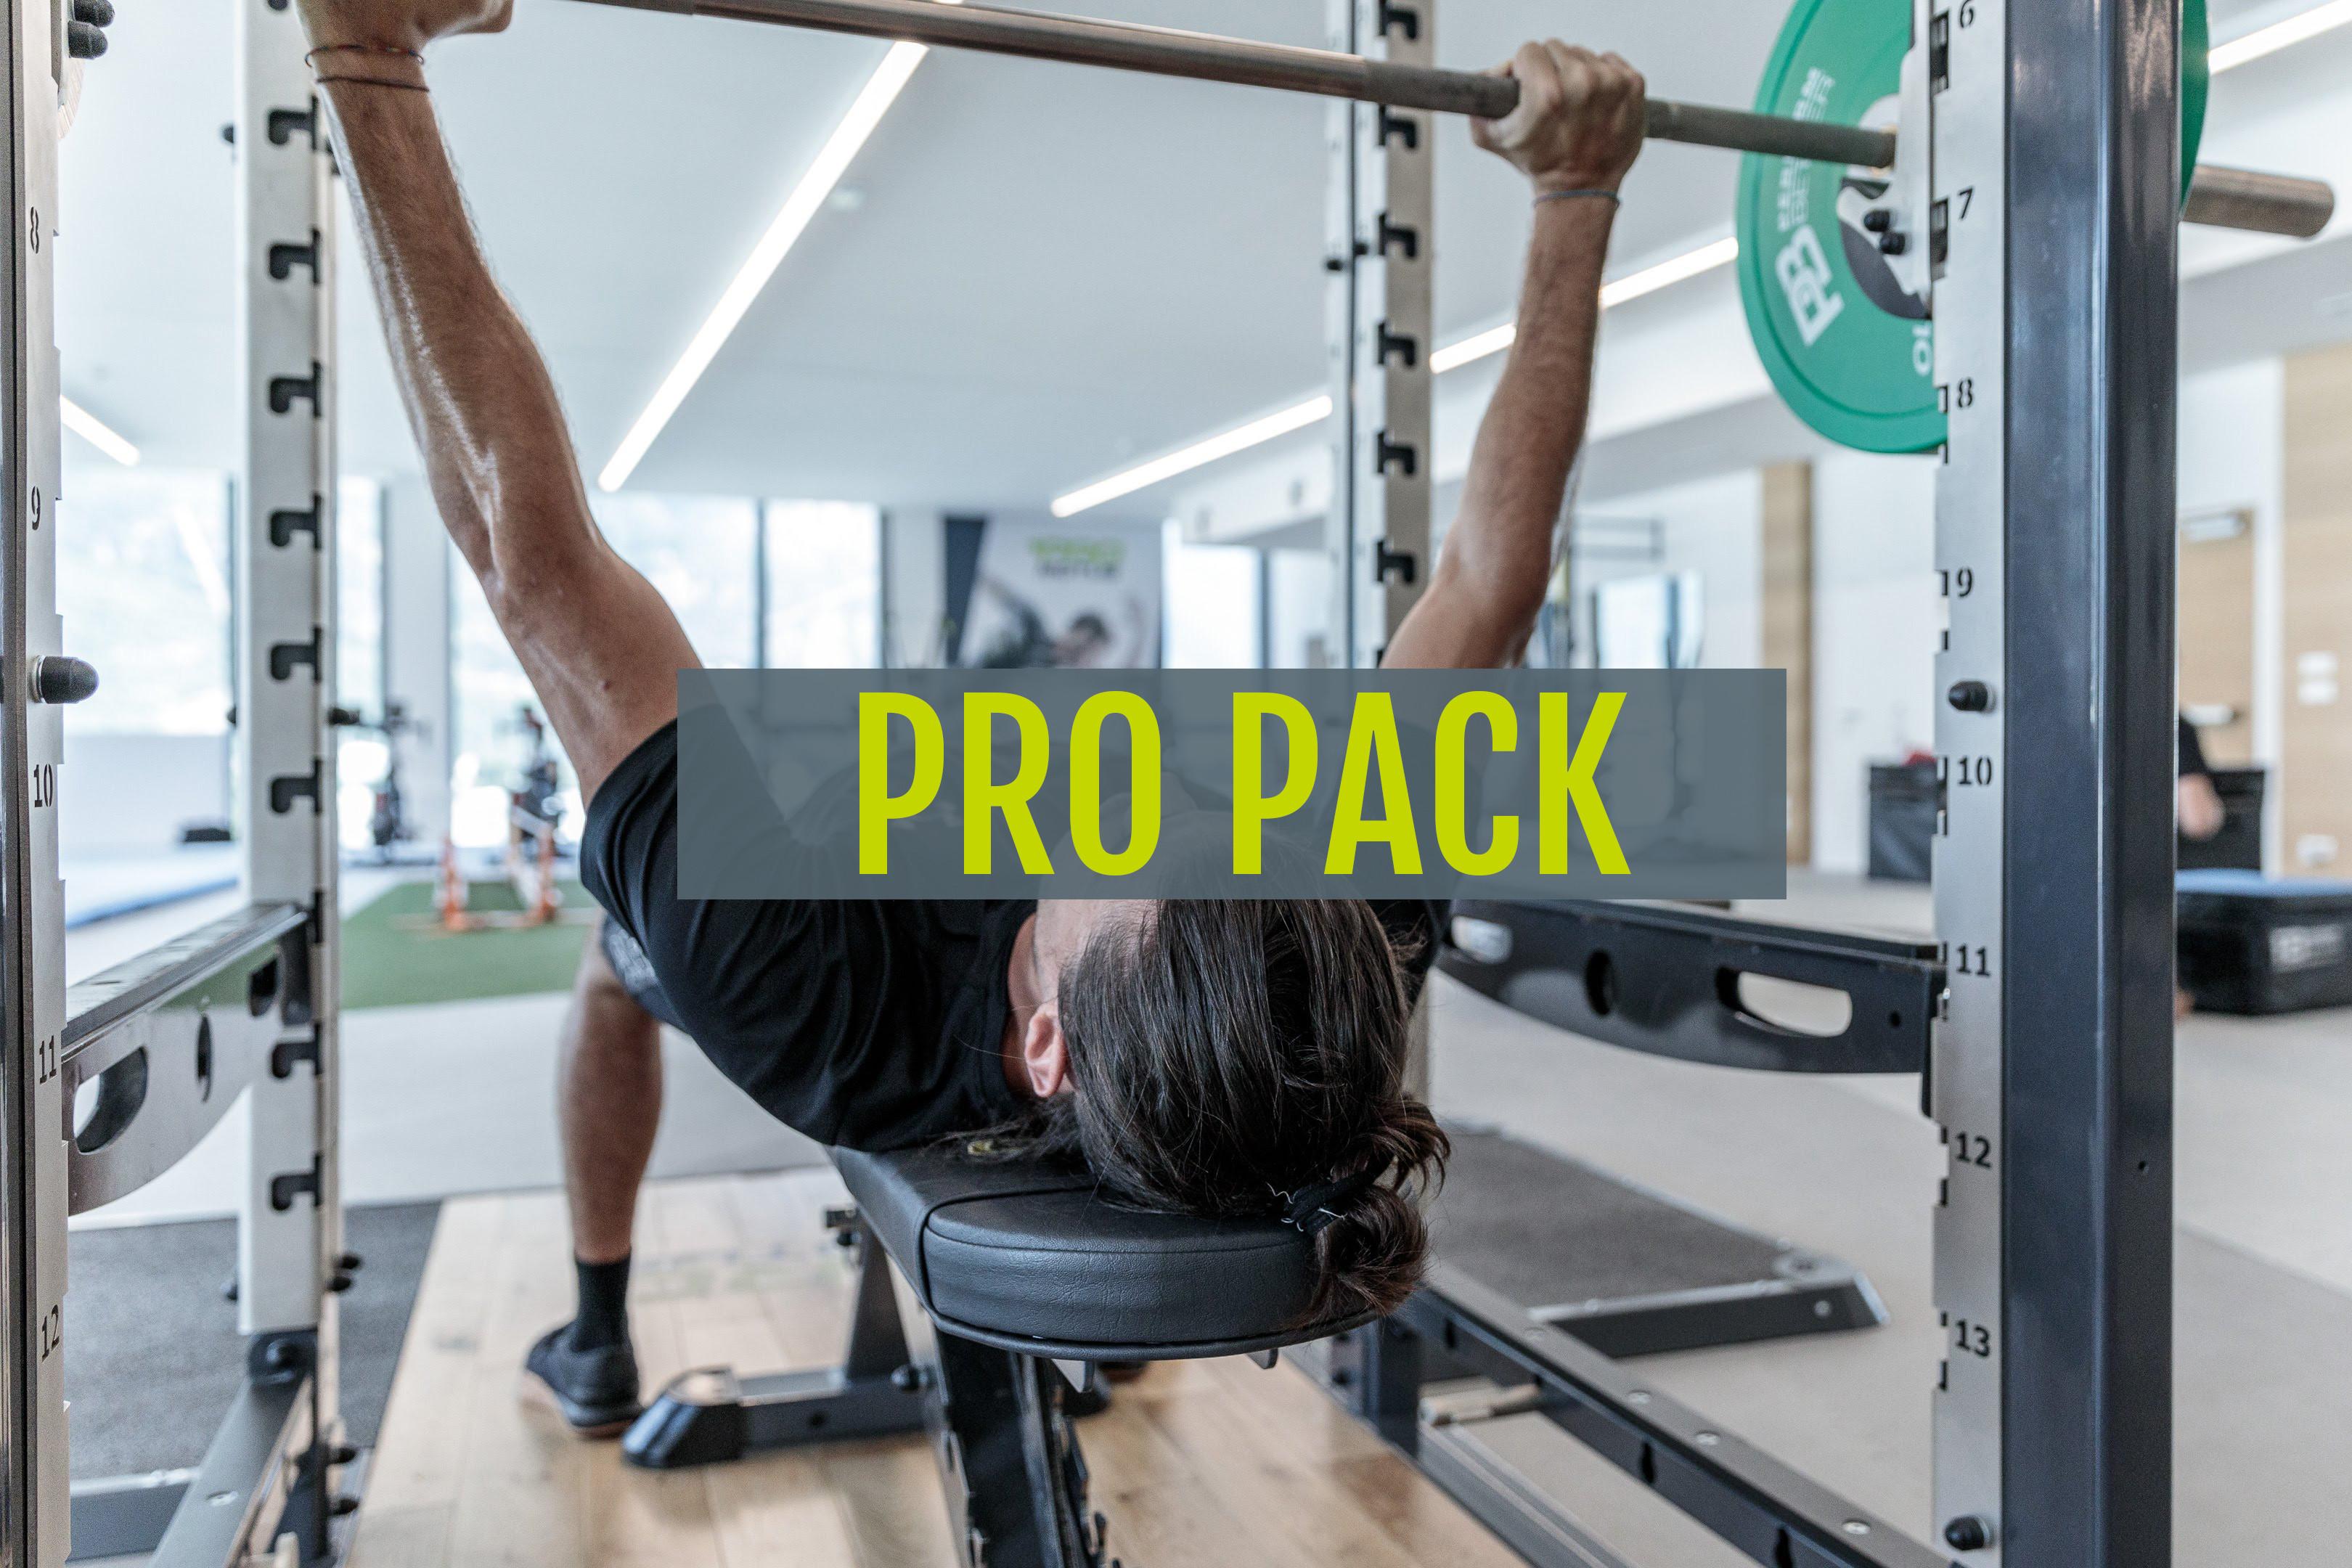 Tennis - Pro Pack